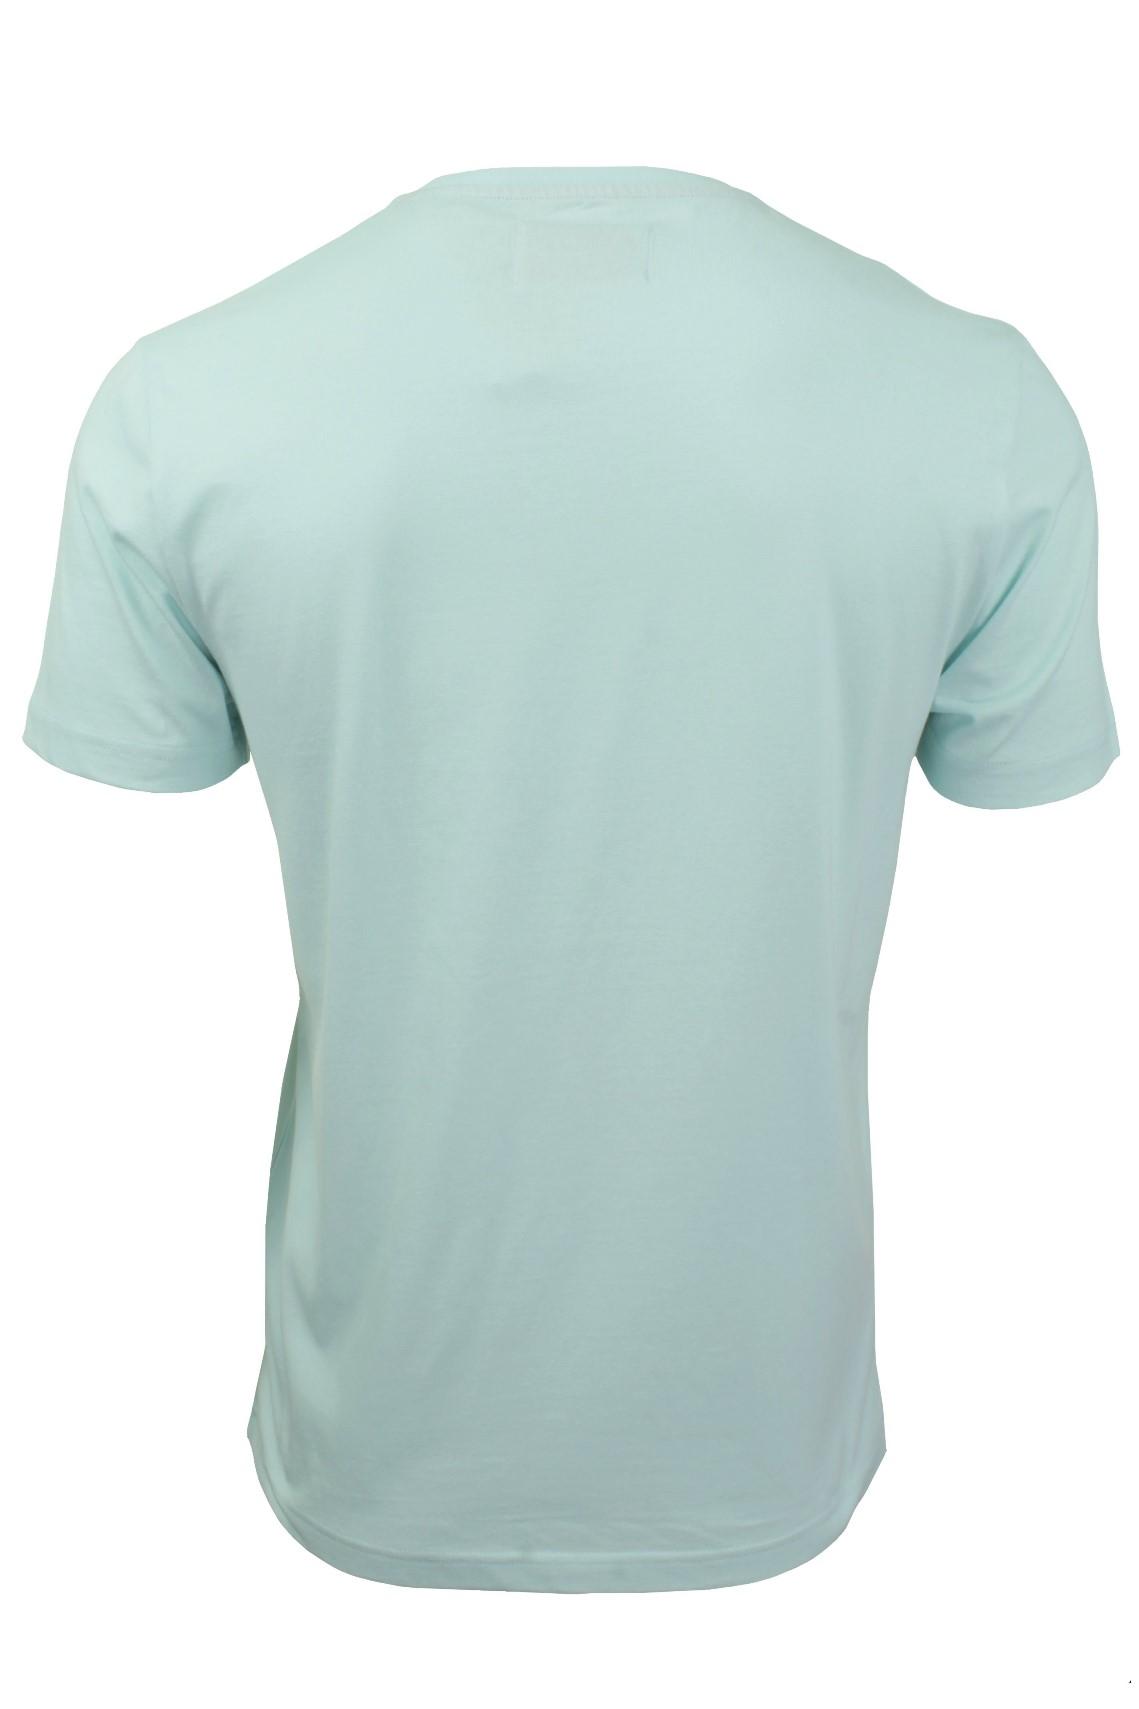 Mens-T-Shirt-by-Original-Penguin-Crew-Neck-Short-Sleeved thumbnail 5